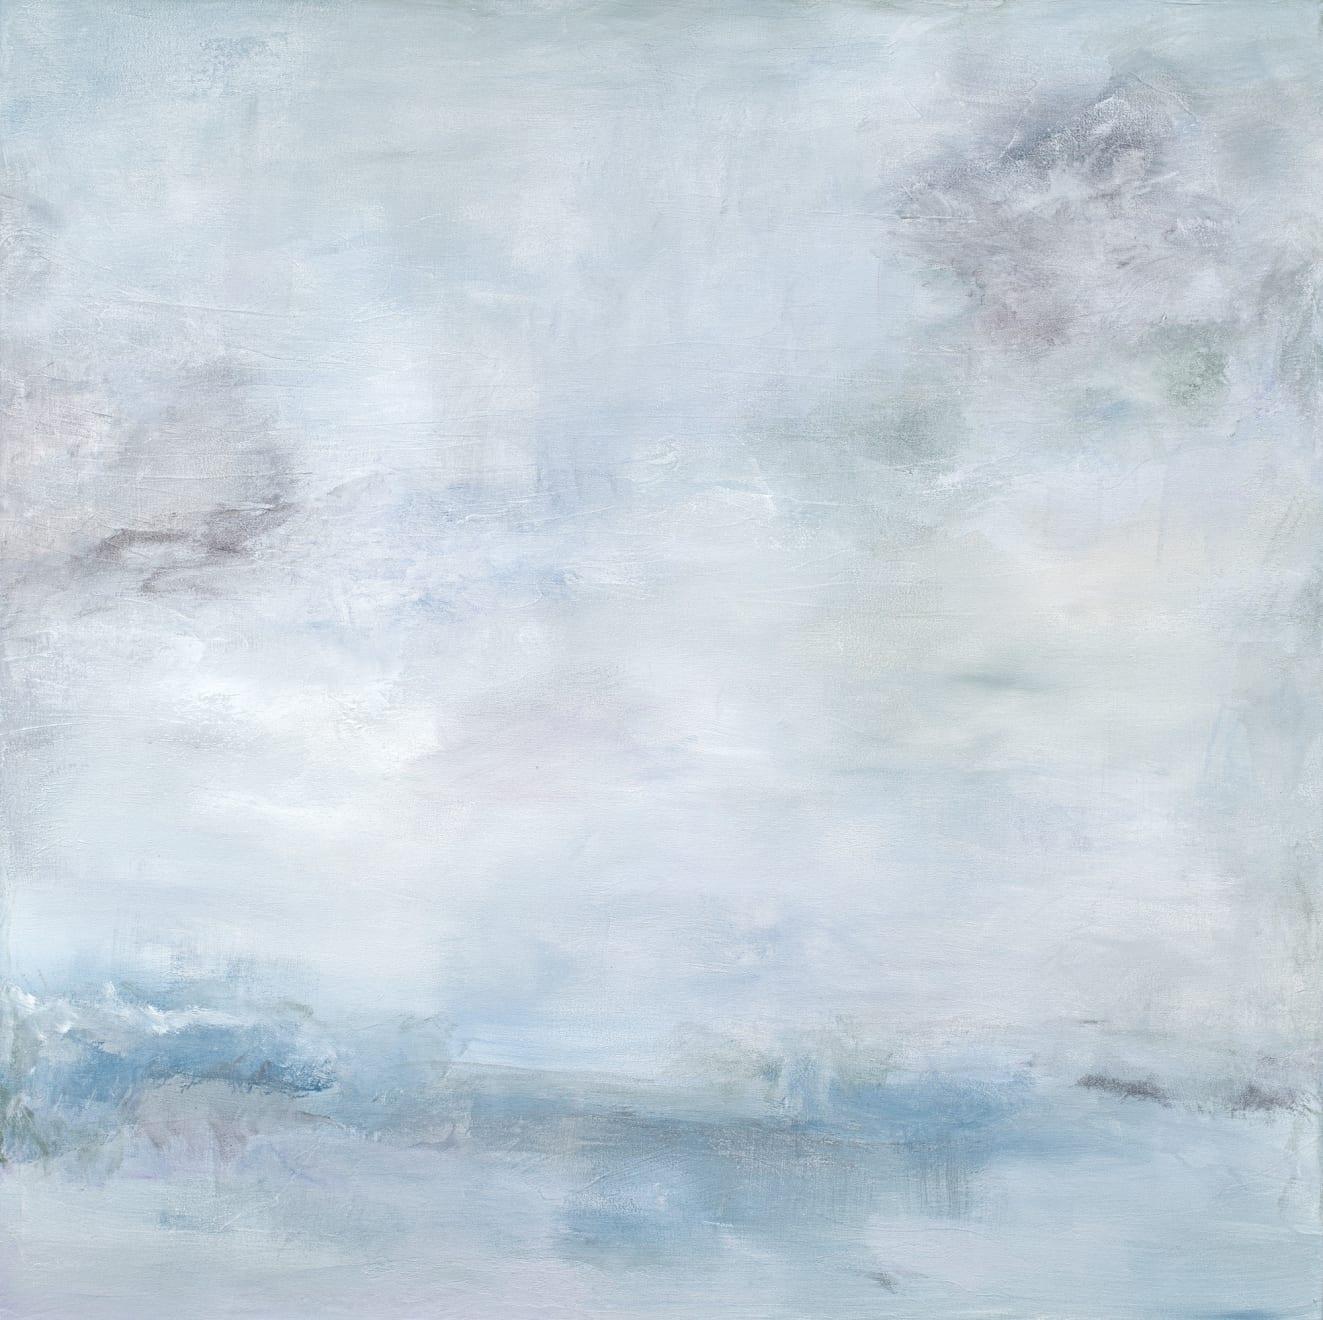 Patricia Qualls, Carmel Mist, 2015